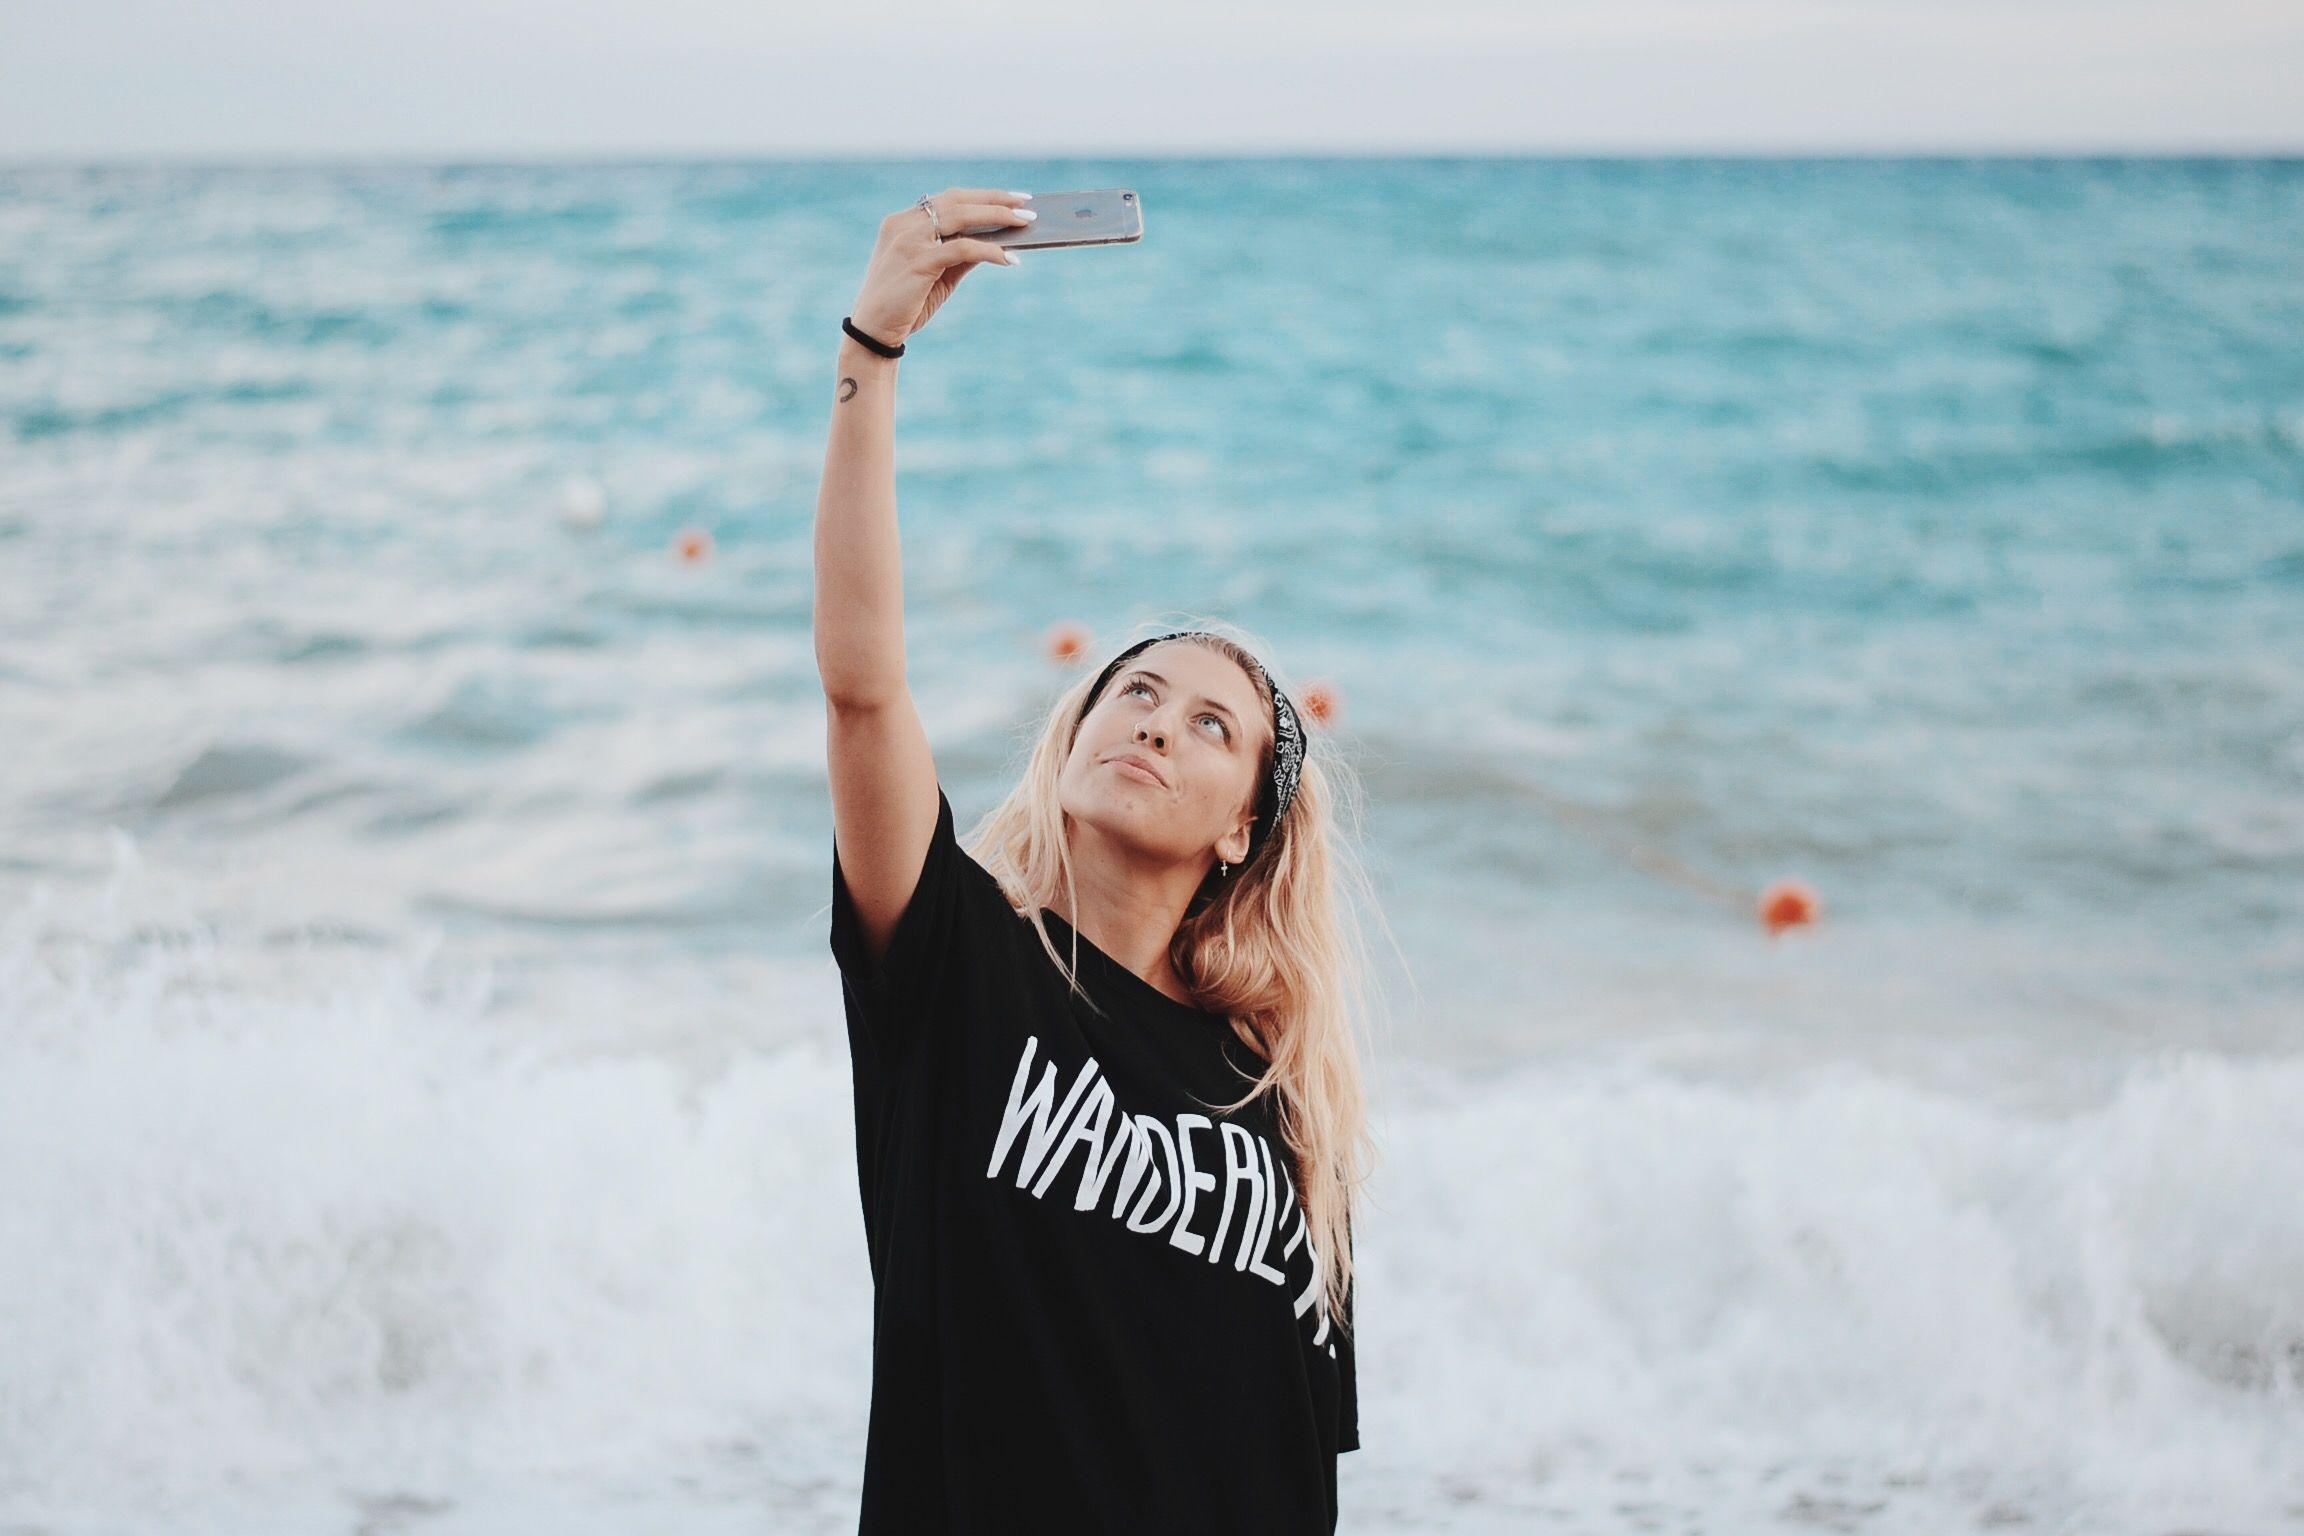 www.losh.it www.instagram.com/loshgram #chiaralosh #blonde #girl #summer #beach #bikini #model #fashion #noperfect #fitnessmodel #fitness #body #outfit #selfie